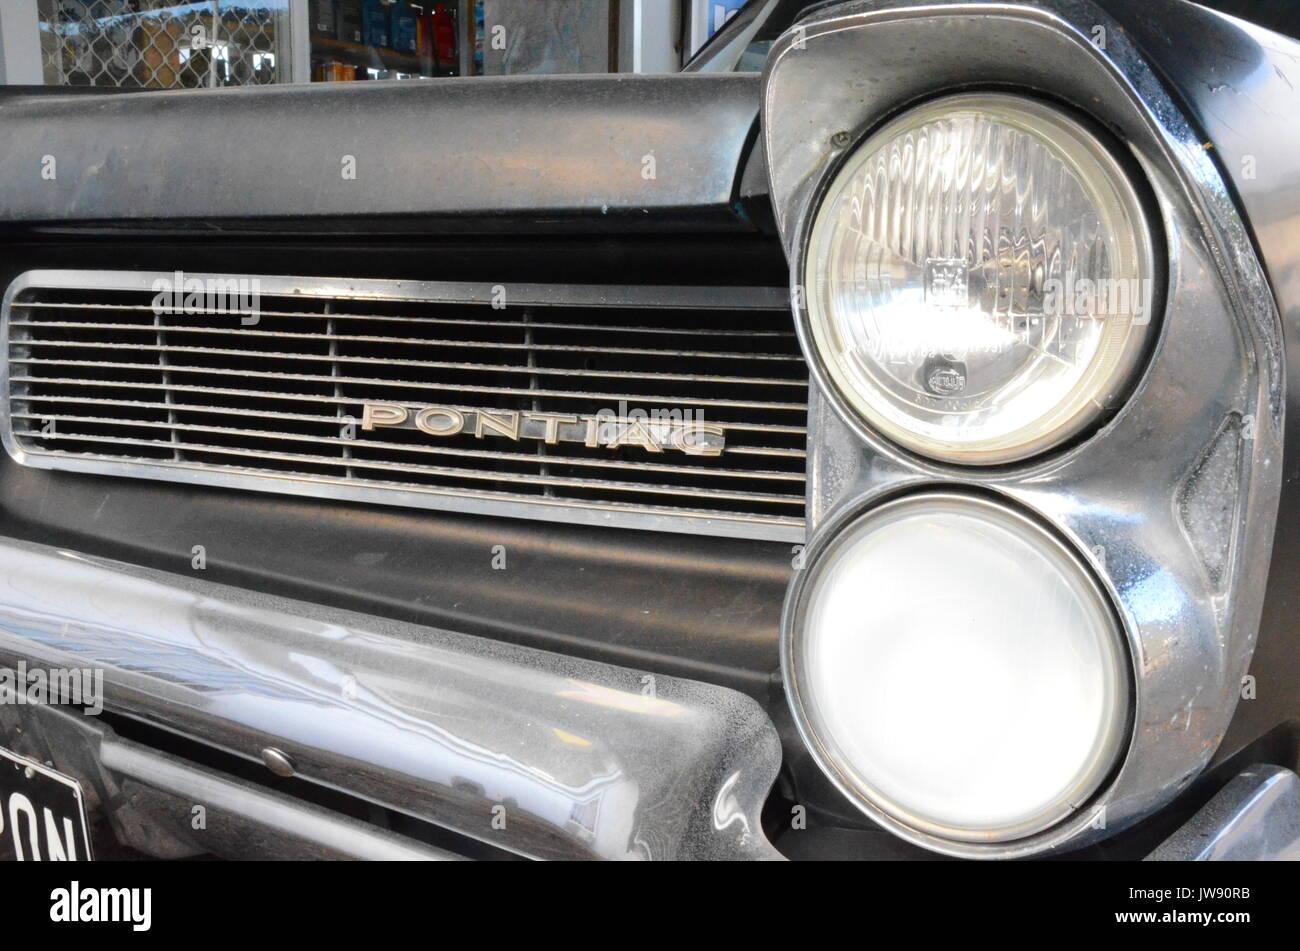 Rat Car Engine Stockfotos & Rat Car Engine Bilder - Alamy